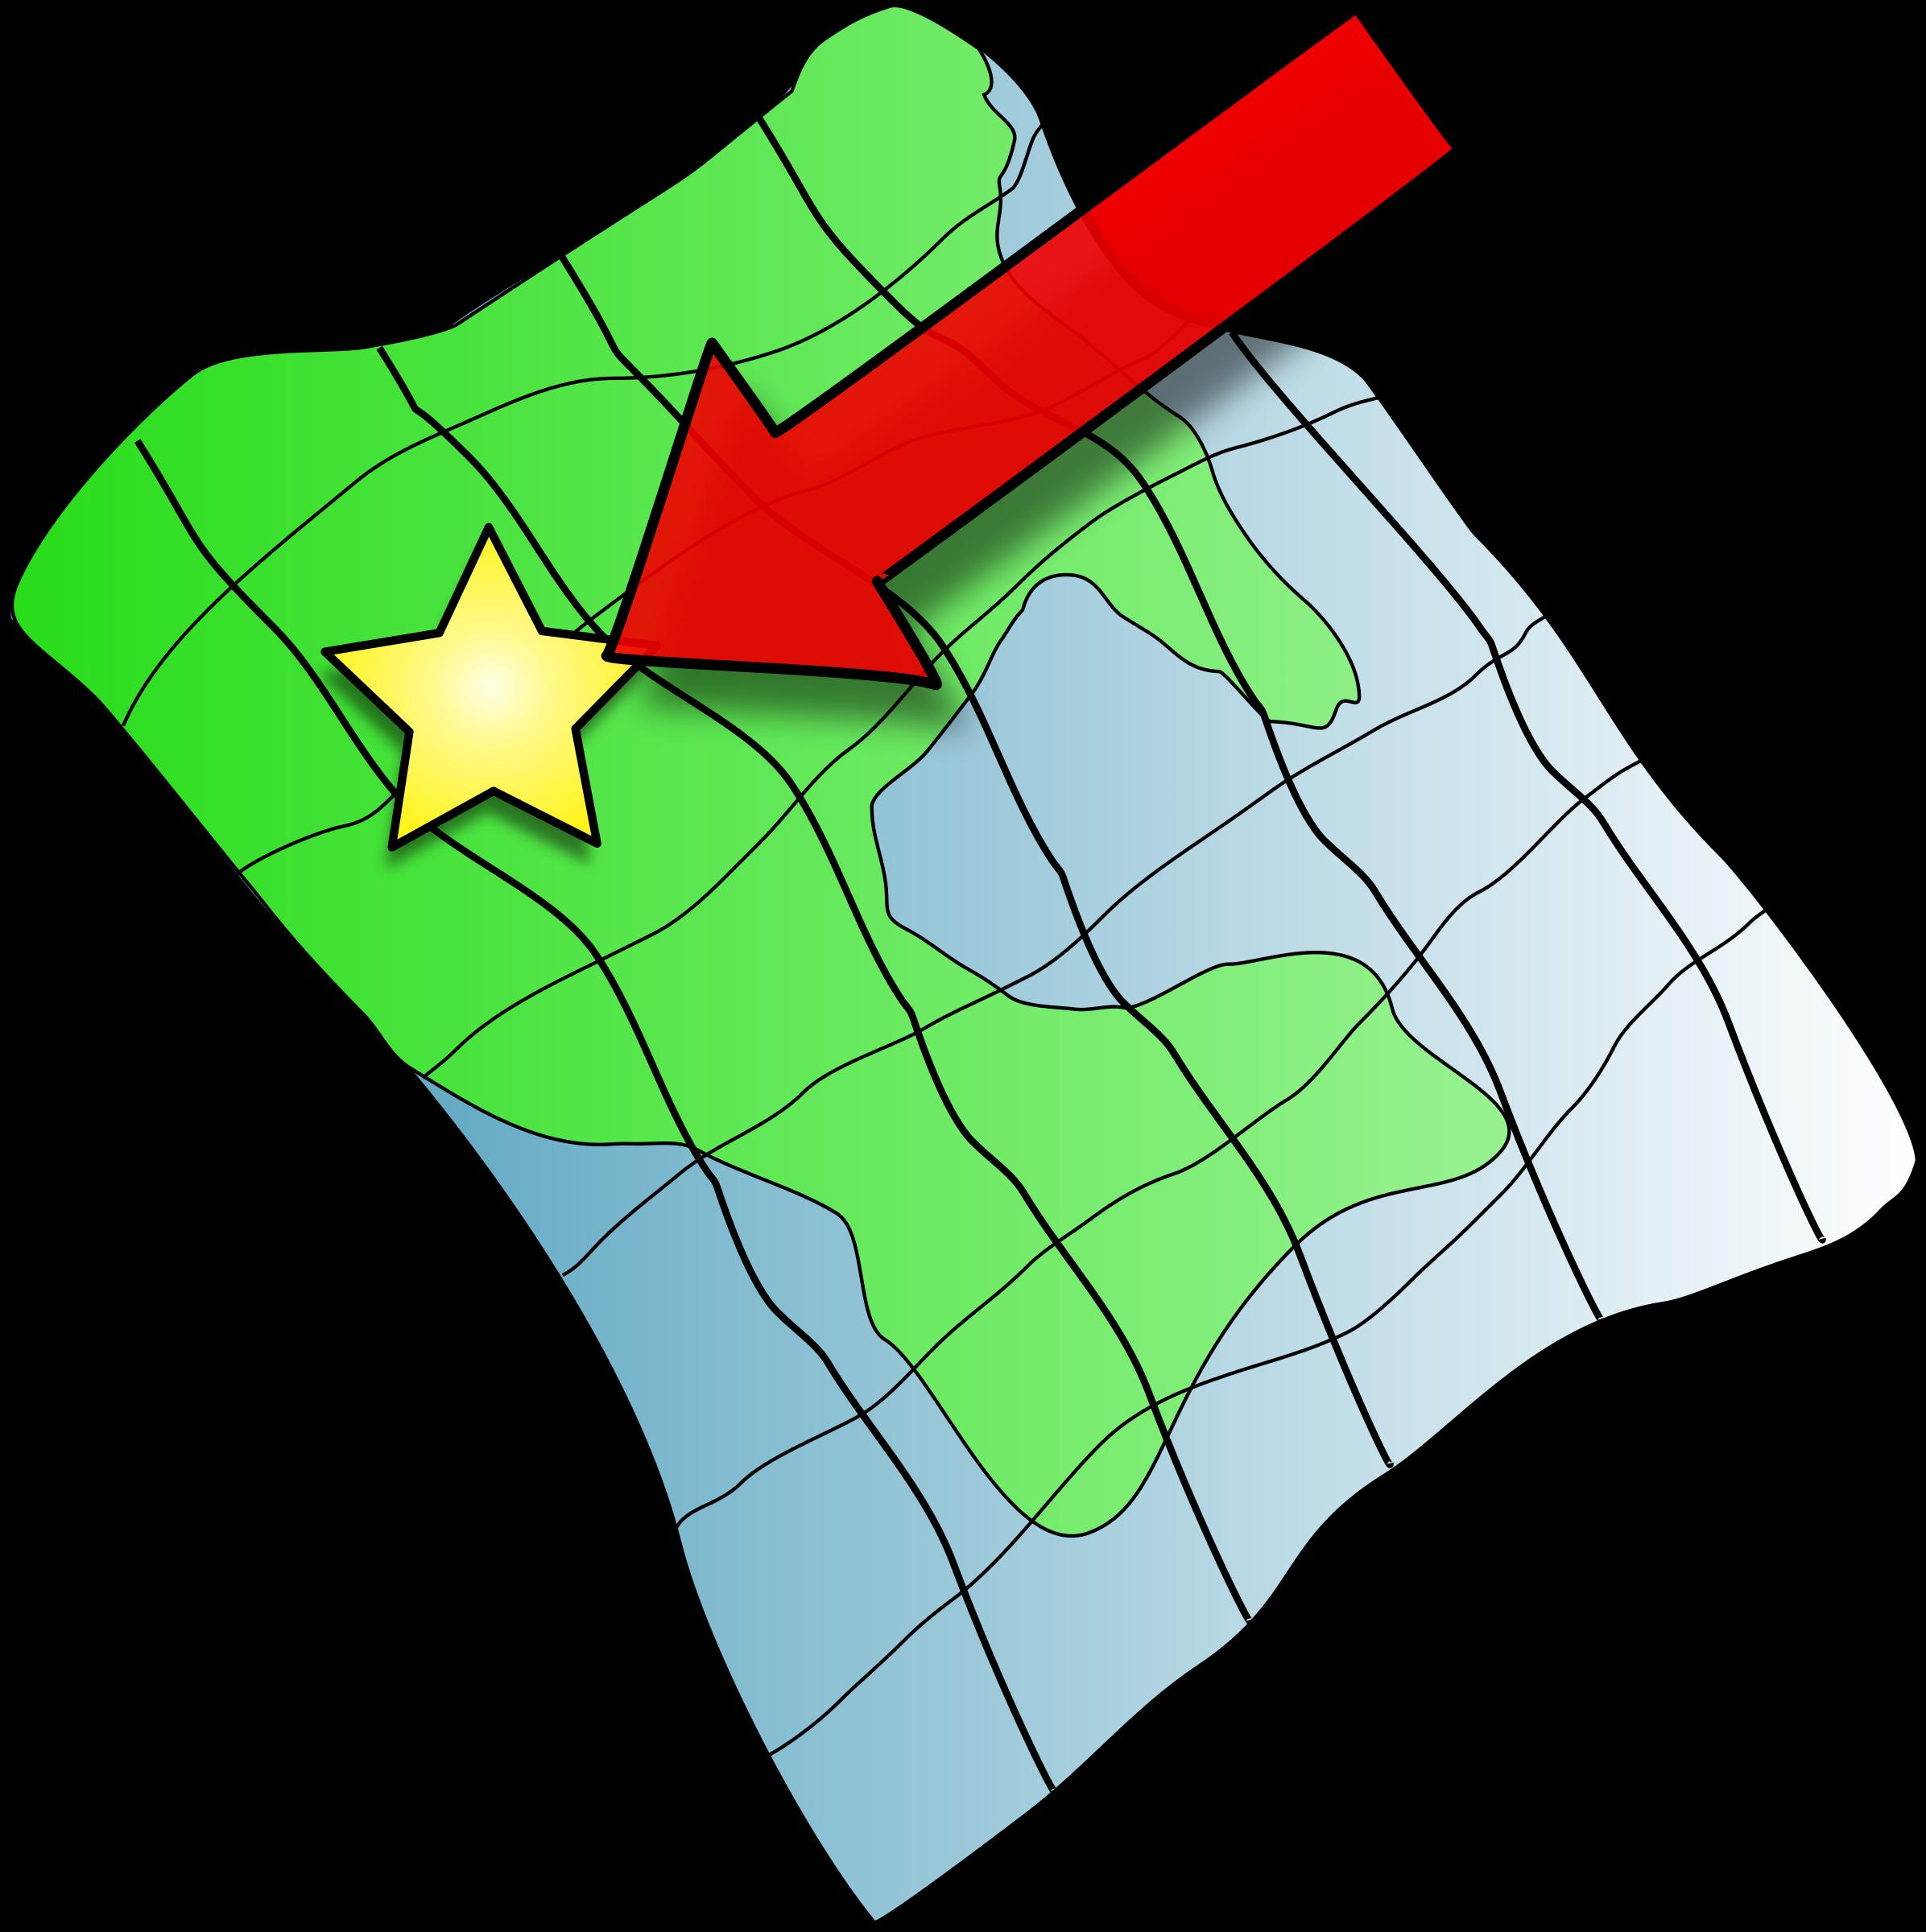 Clipart map generic. Ruffled big image png